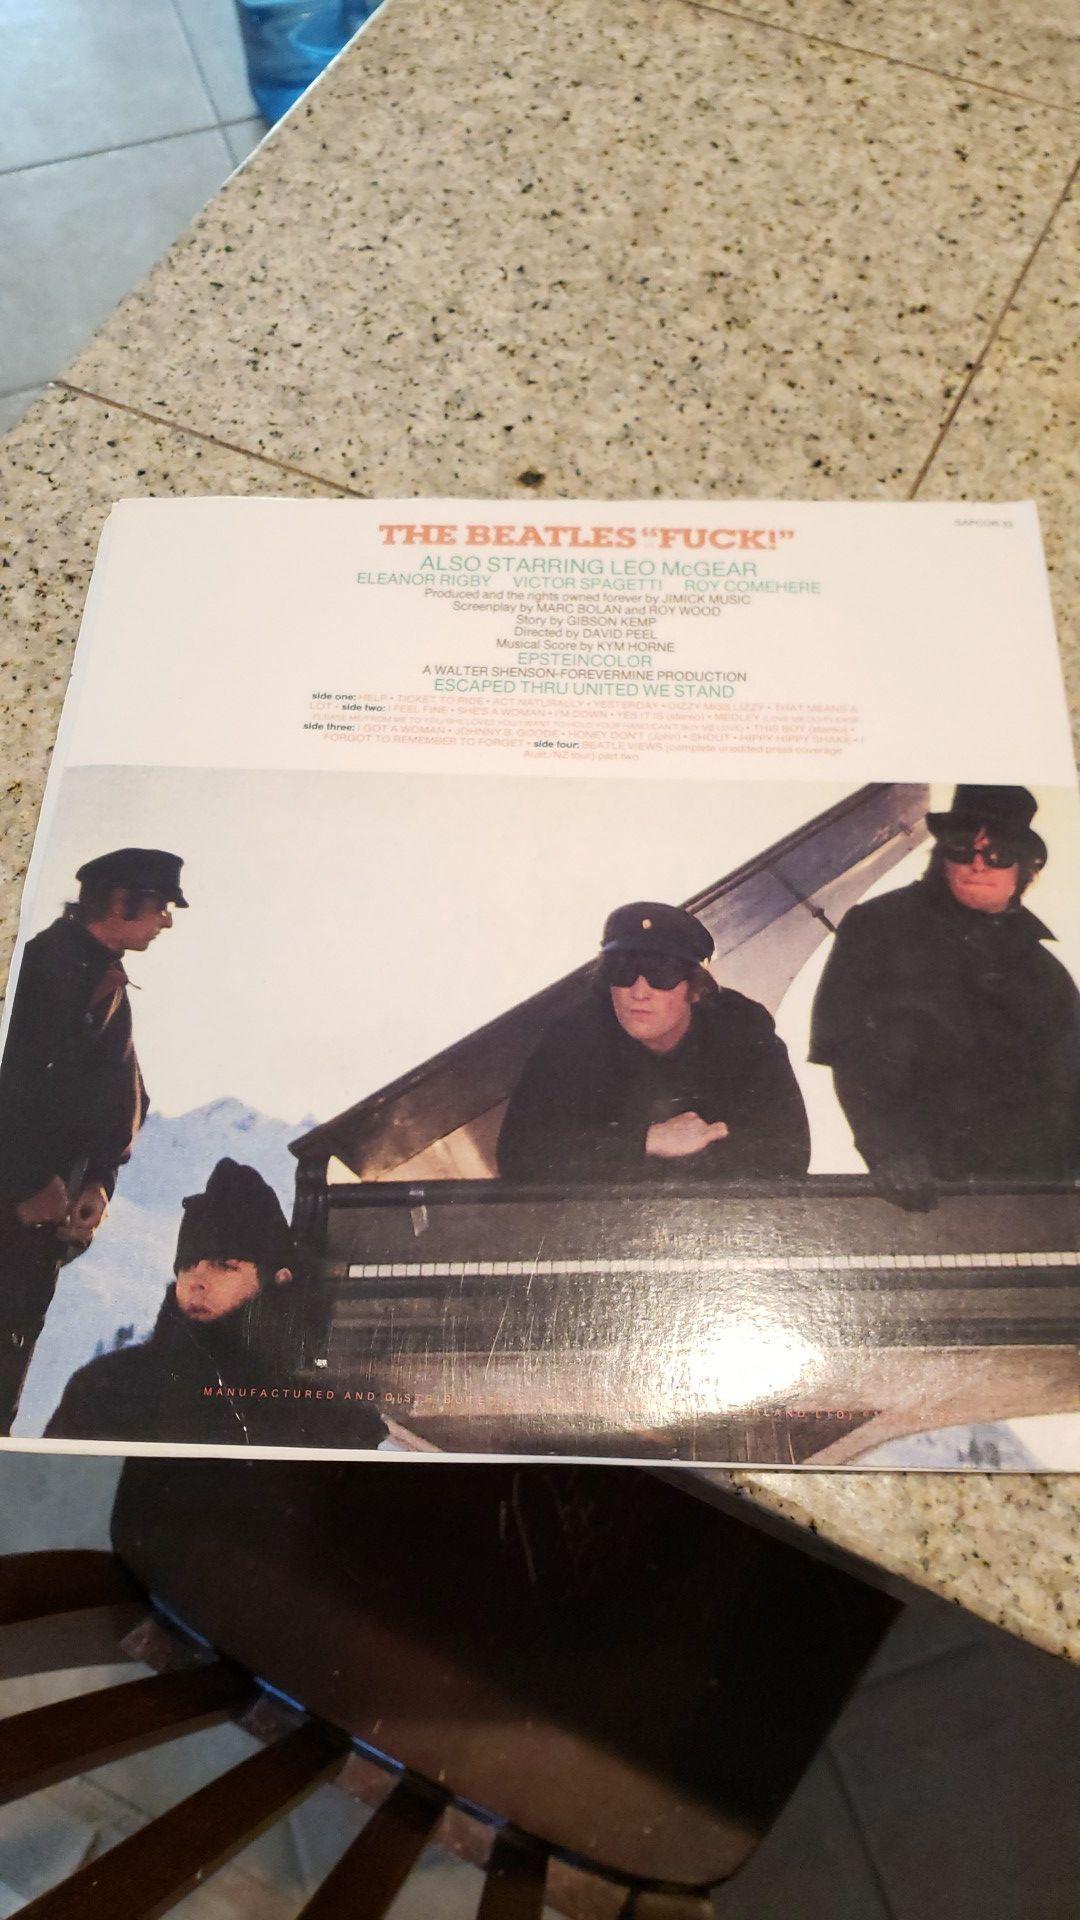 The beatles bootleg